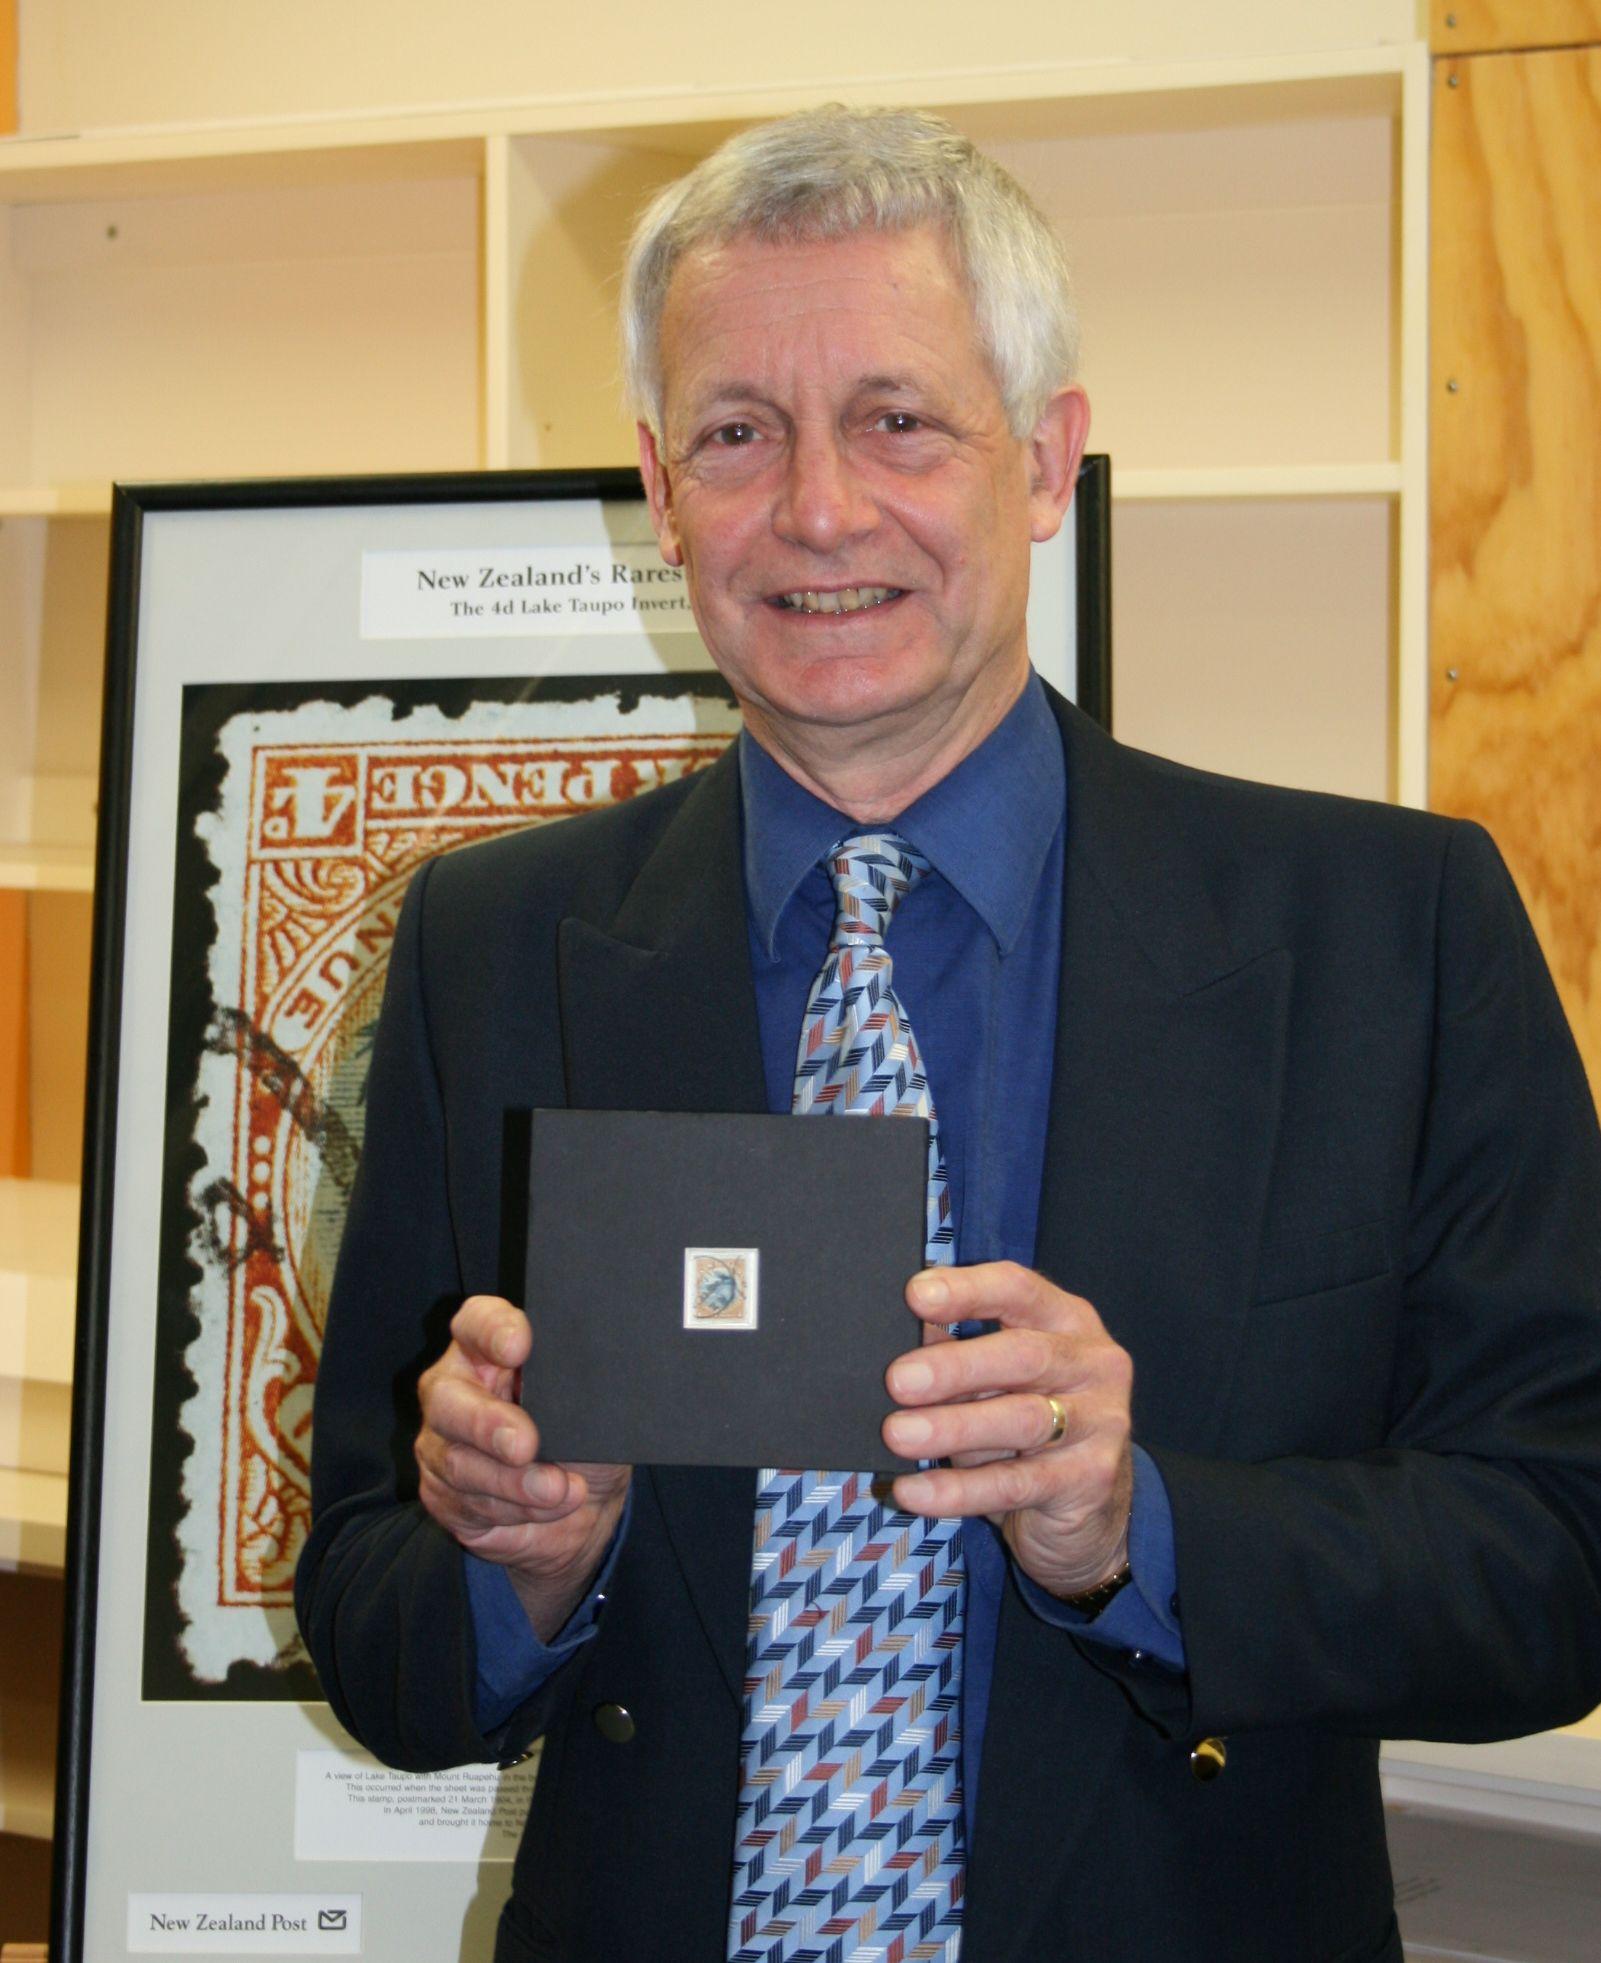 Te Papa S Blog New Zealand S Rarest Stamp Now At Te Papa